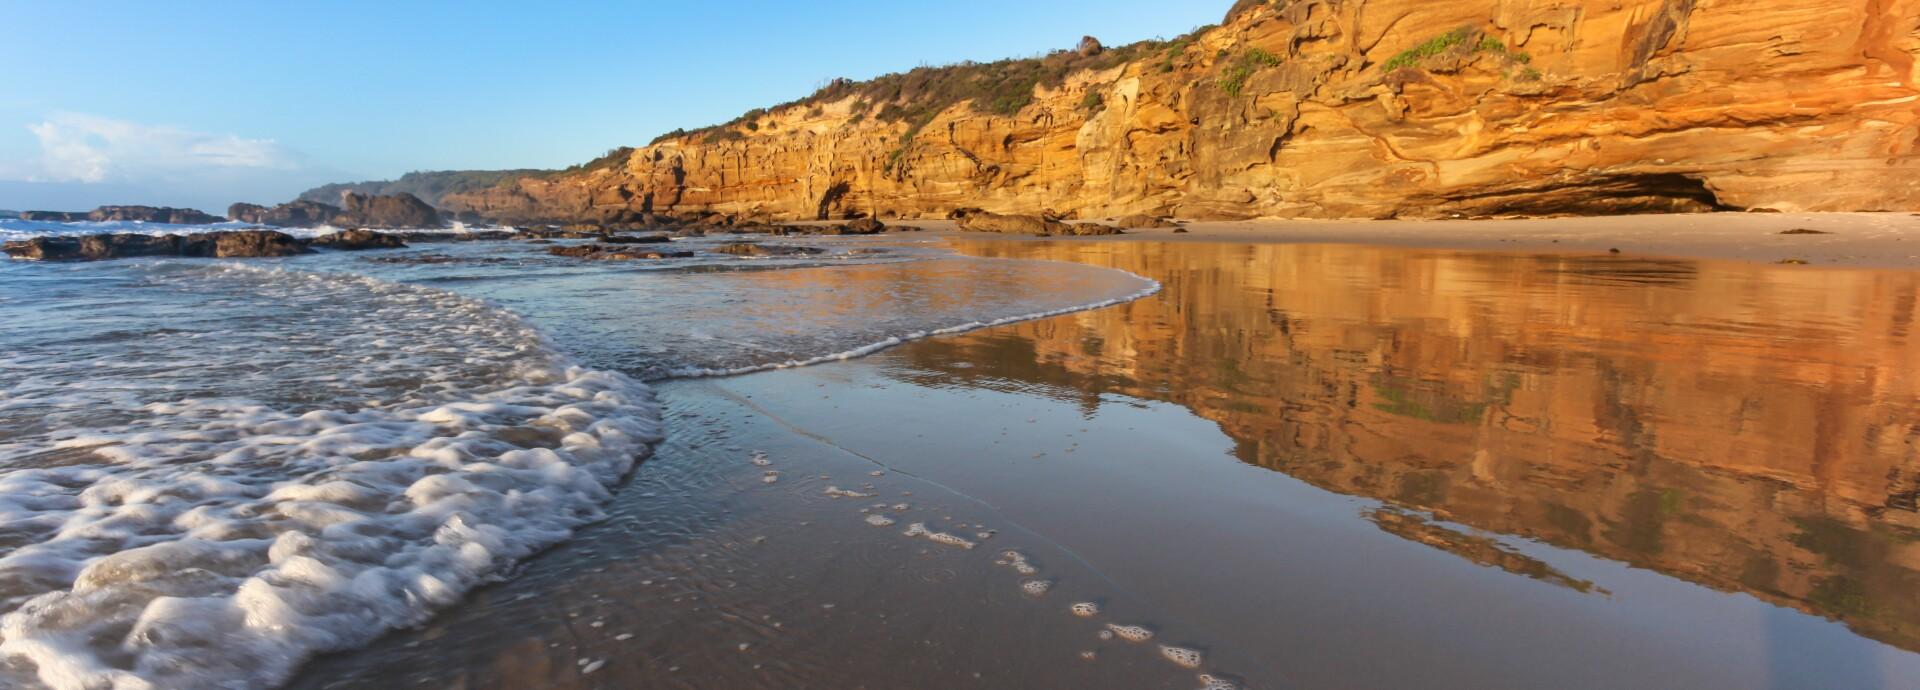 Caves Beach Central Coast NSW Australia - Morning Seascape